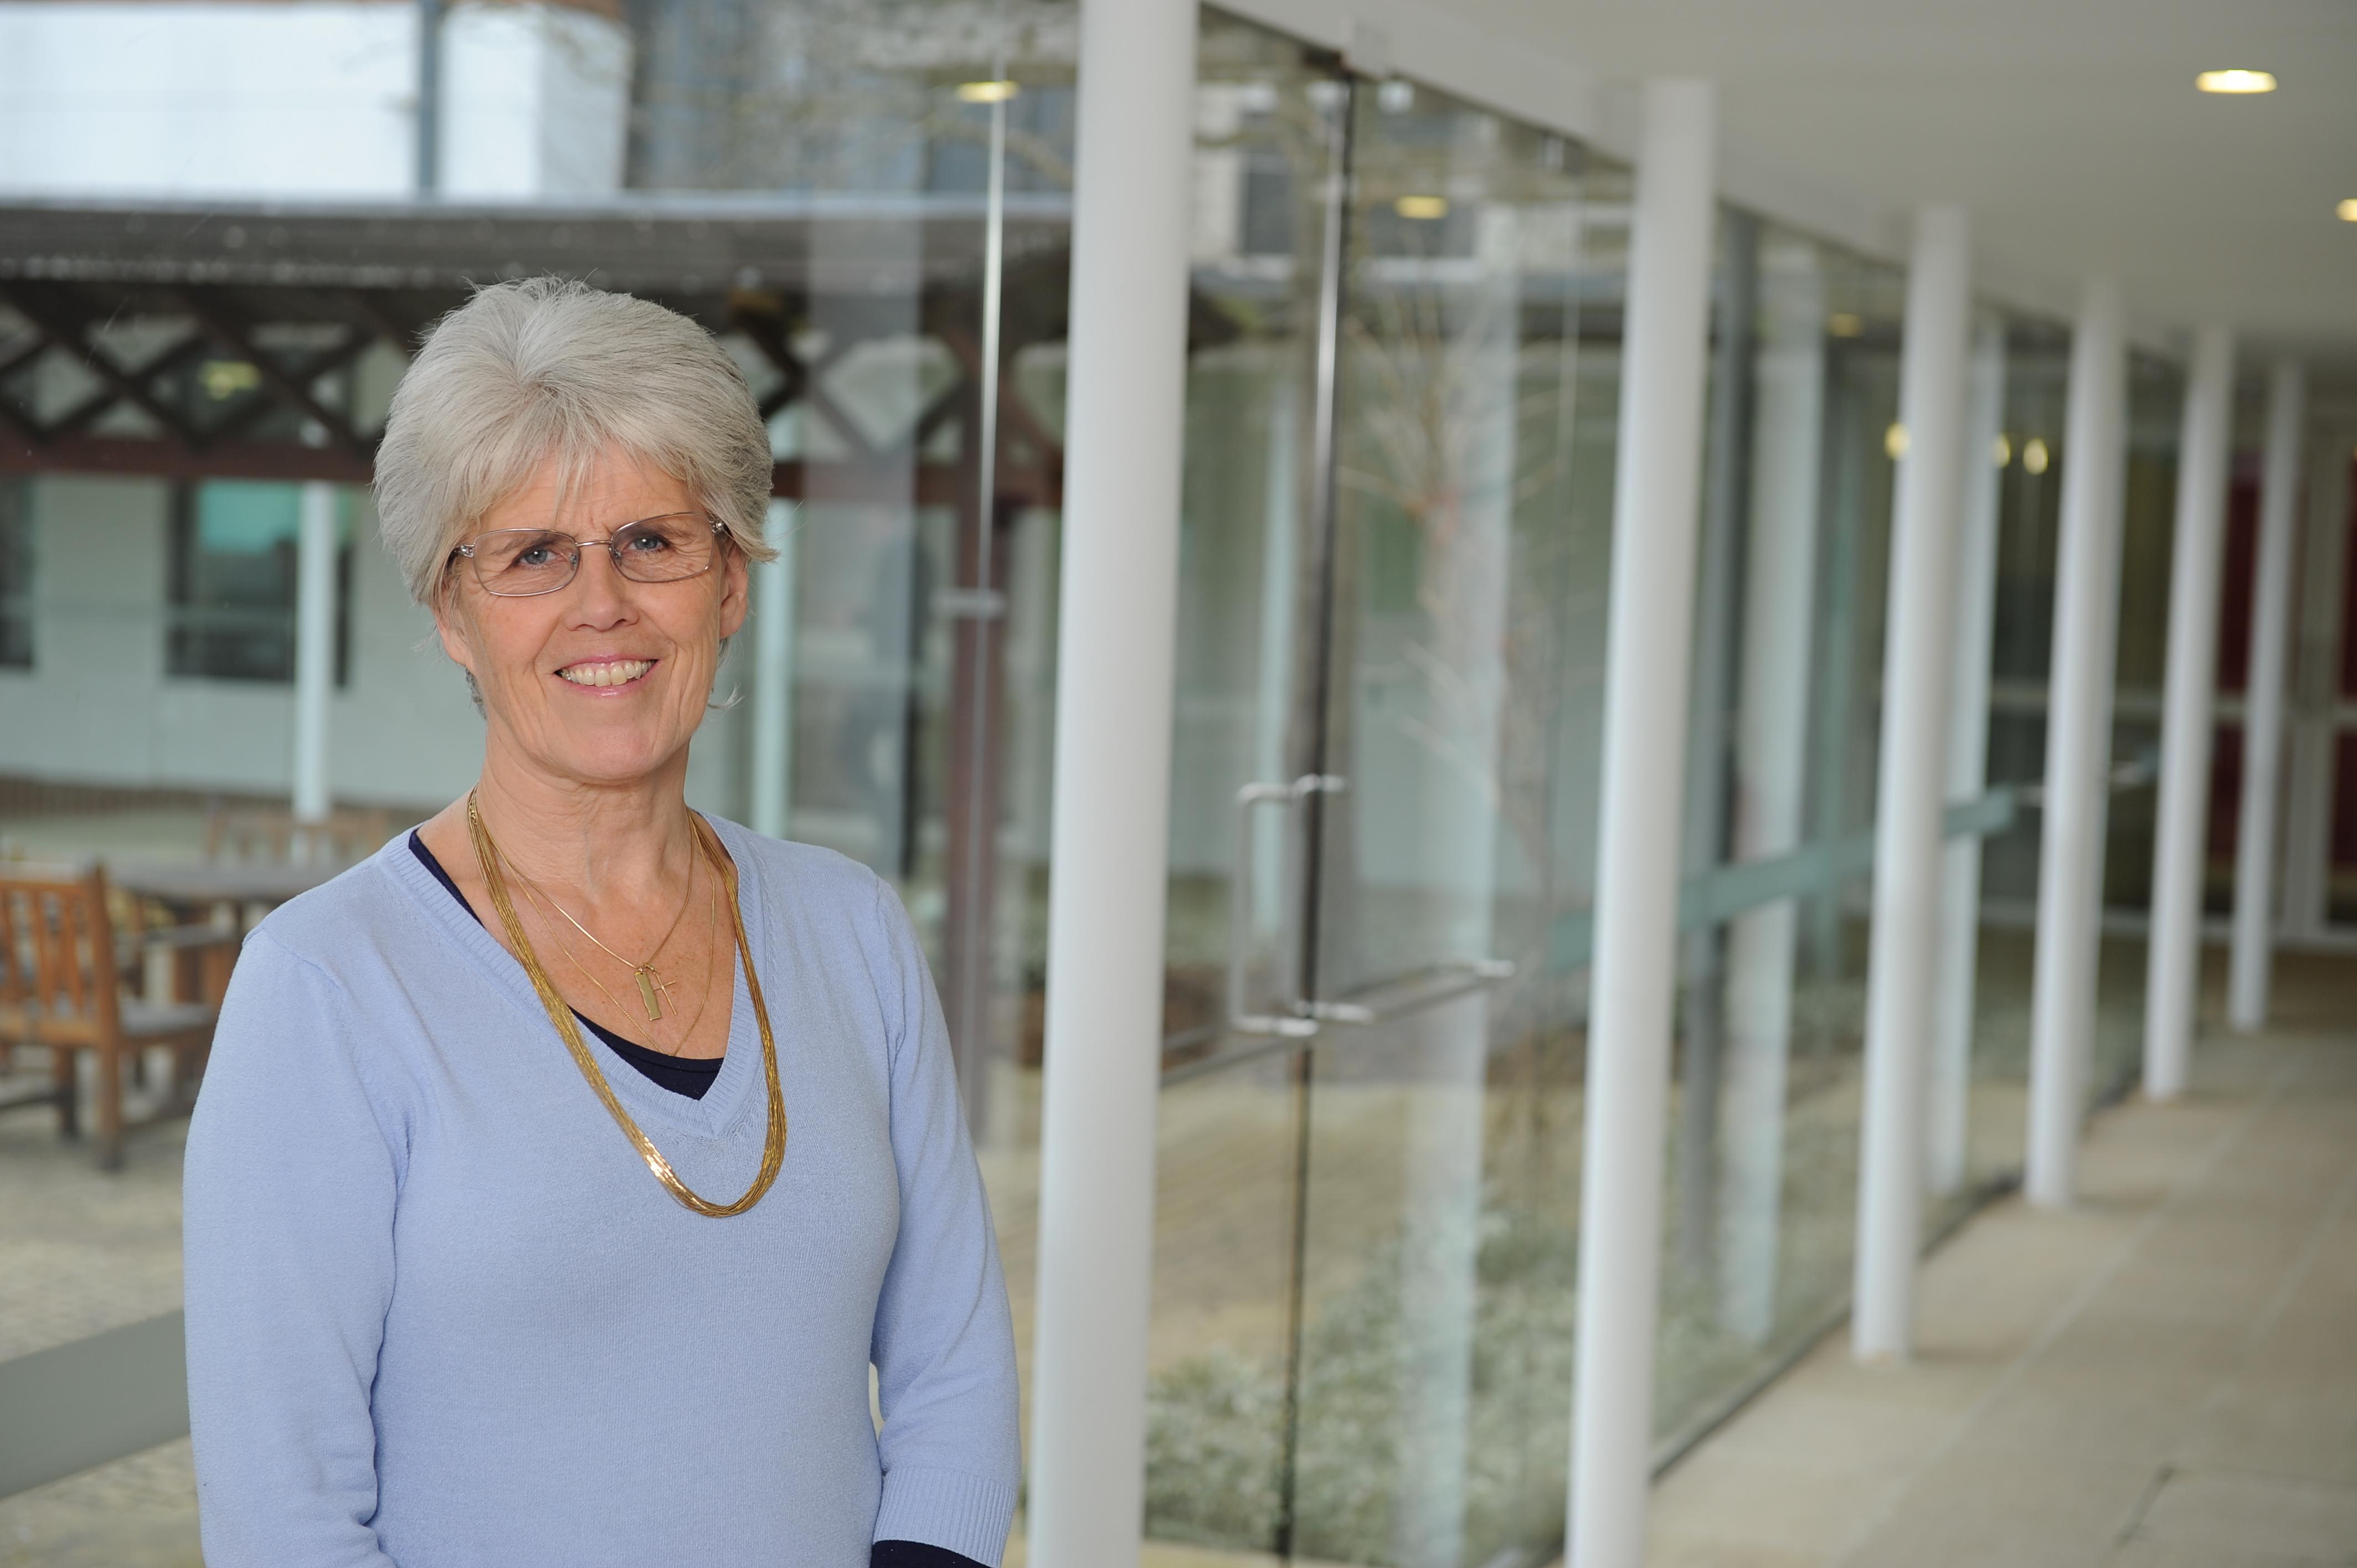 Professor Jane McKenzie